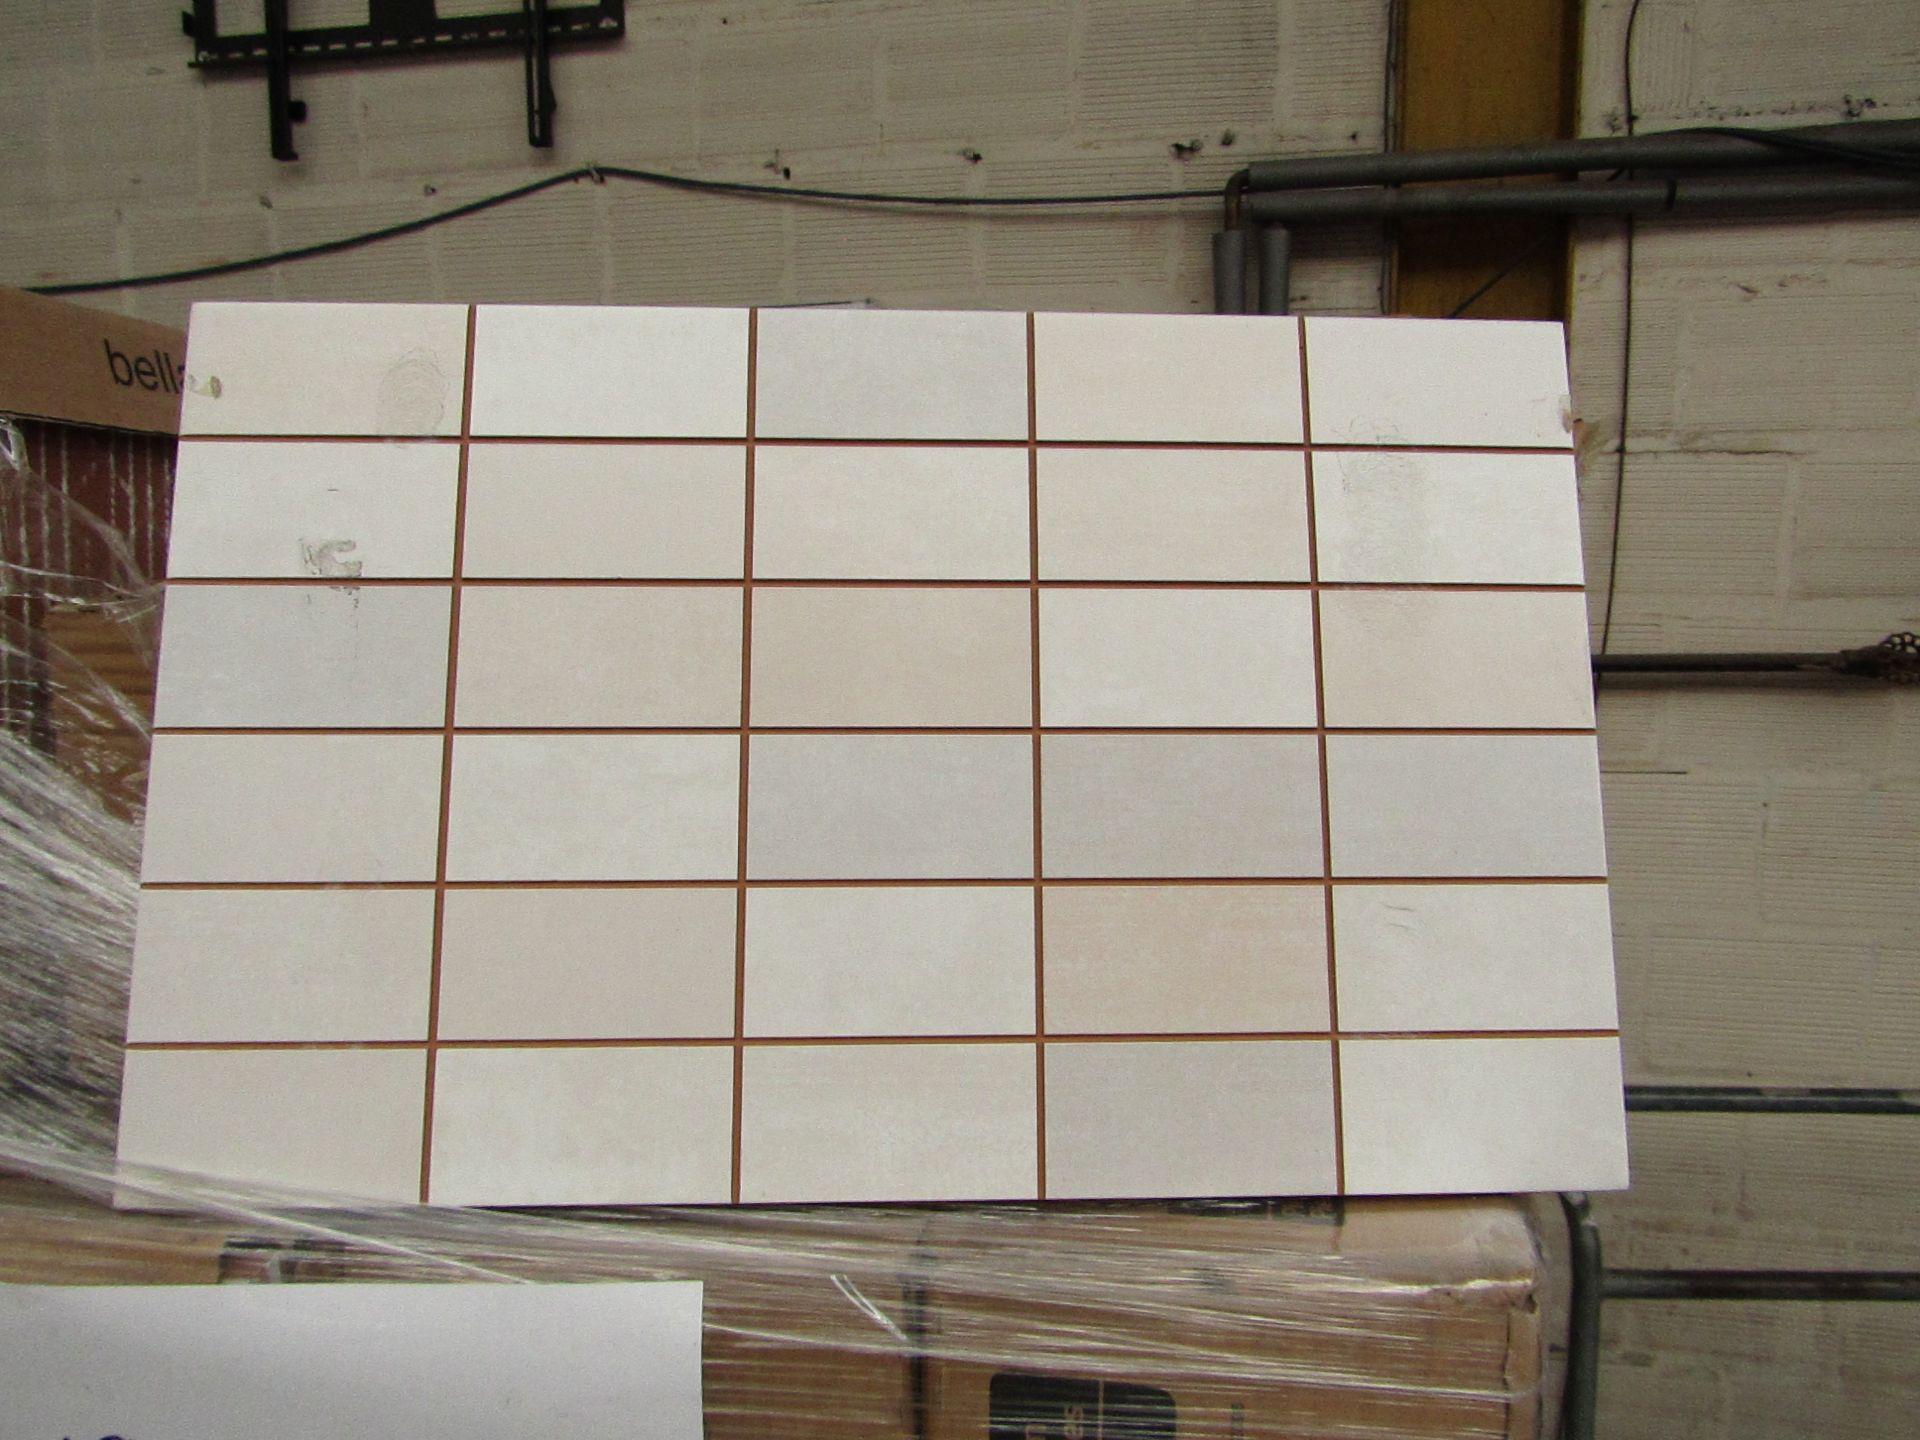 Lotto 395 - 9x packs of 17 Bella Vista Freya Cream mosaic tiles 400x250, RRP £16.66 giving a total lot RRP of